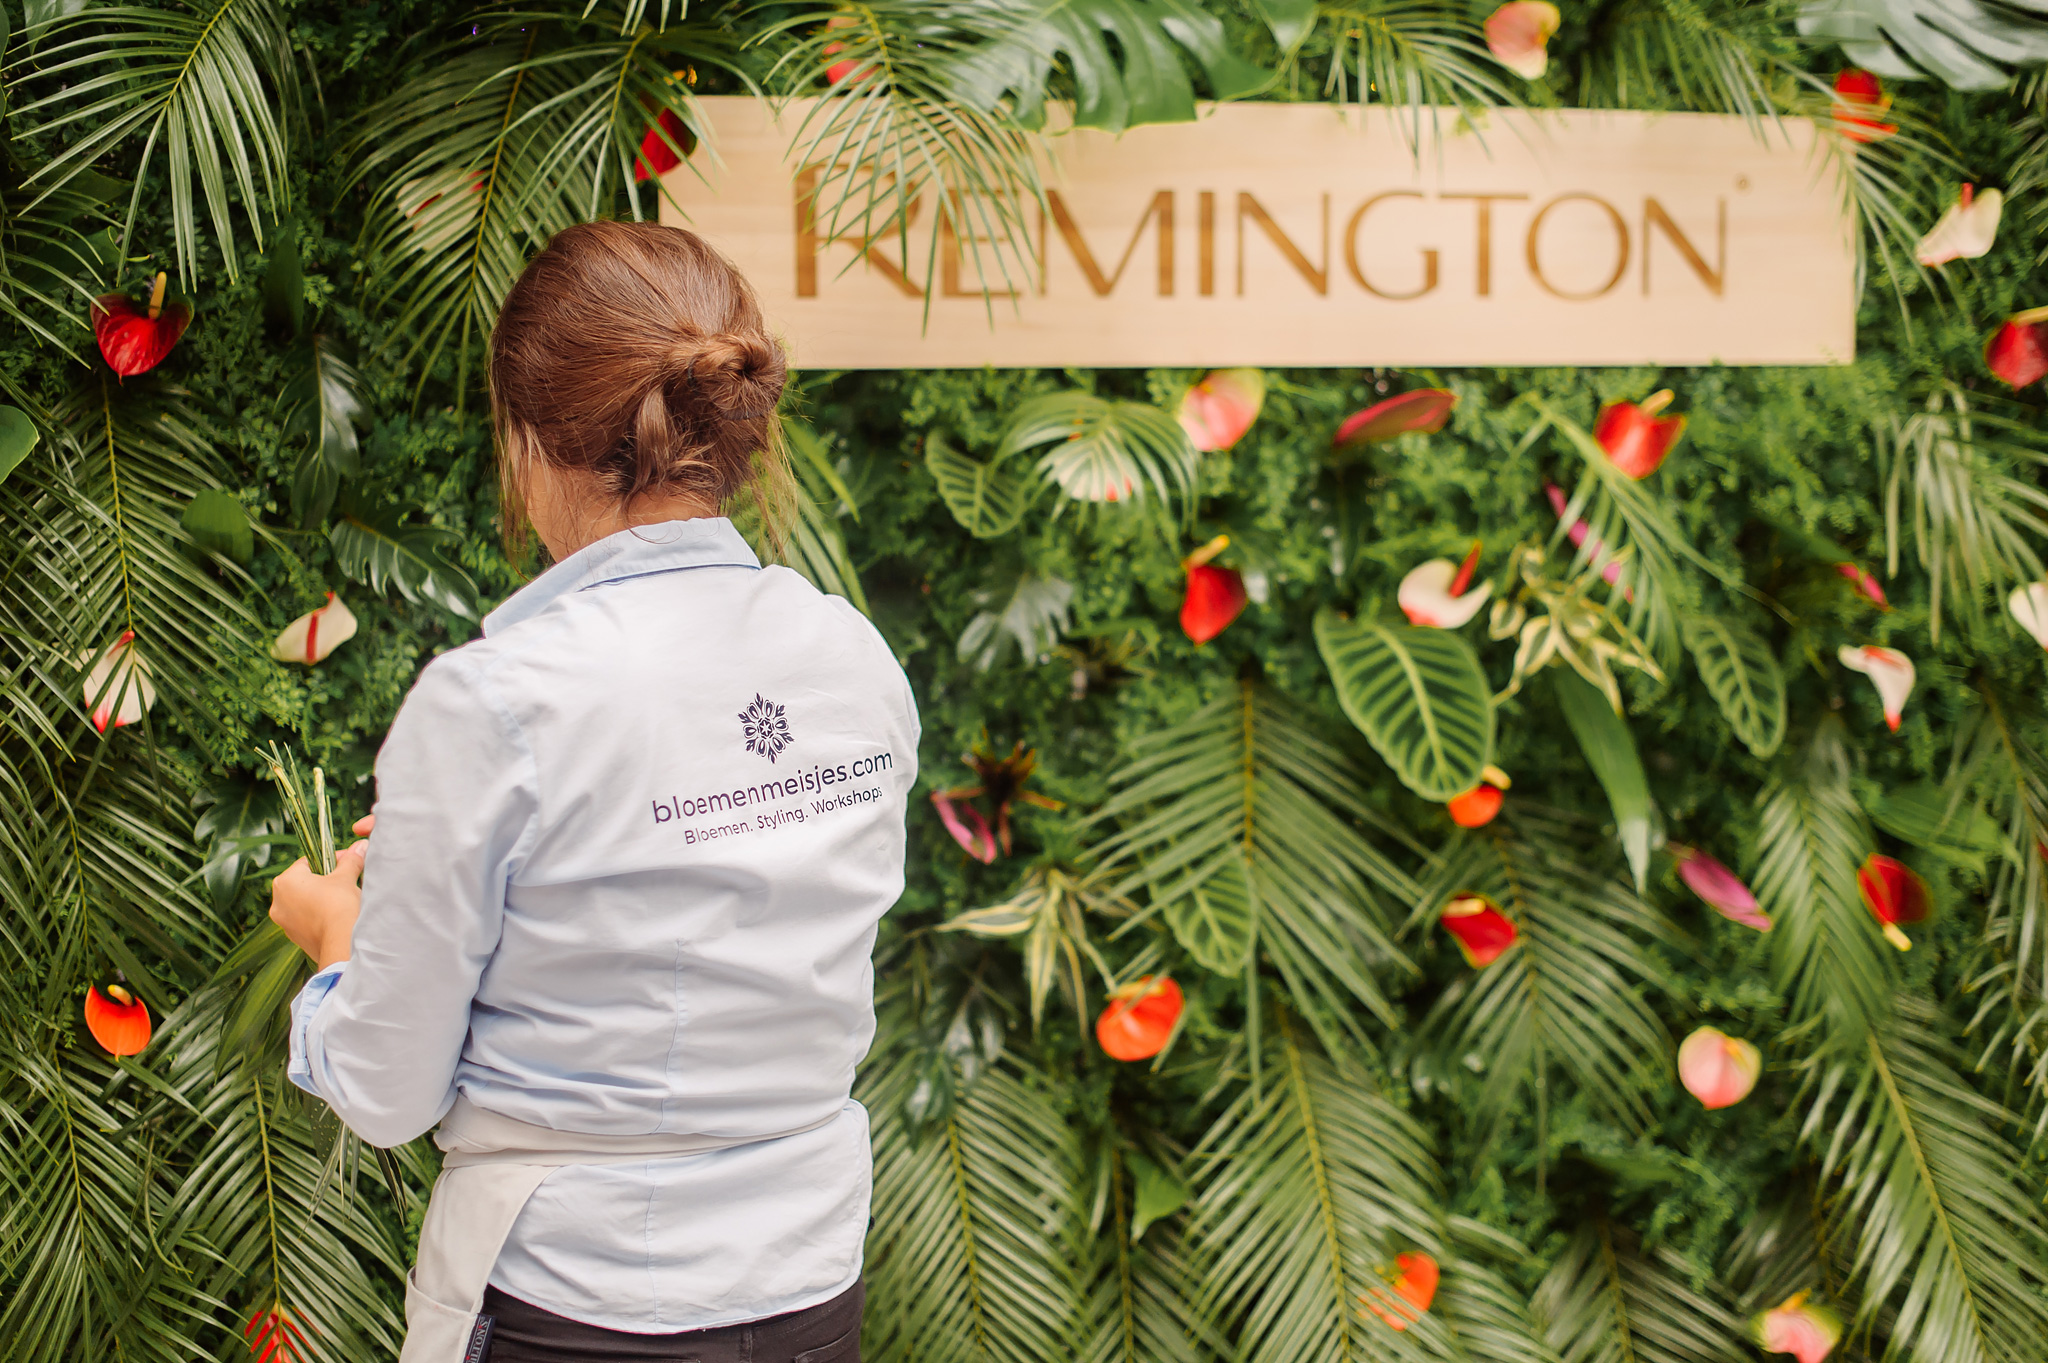 Remington_01.jpg